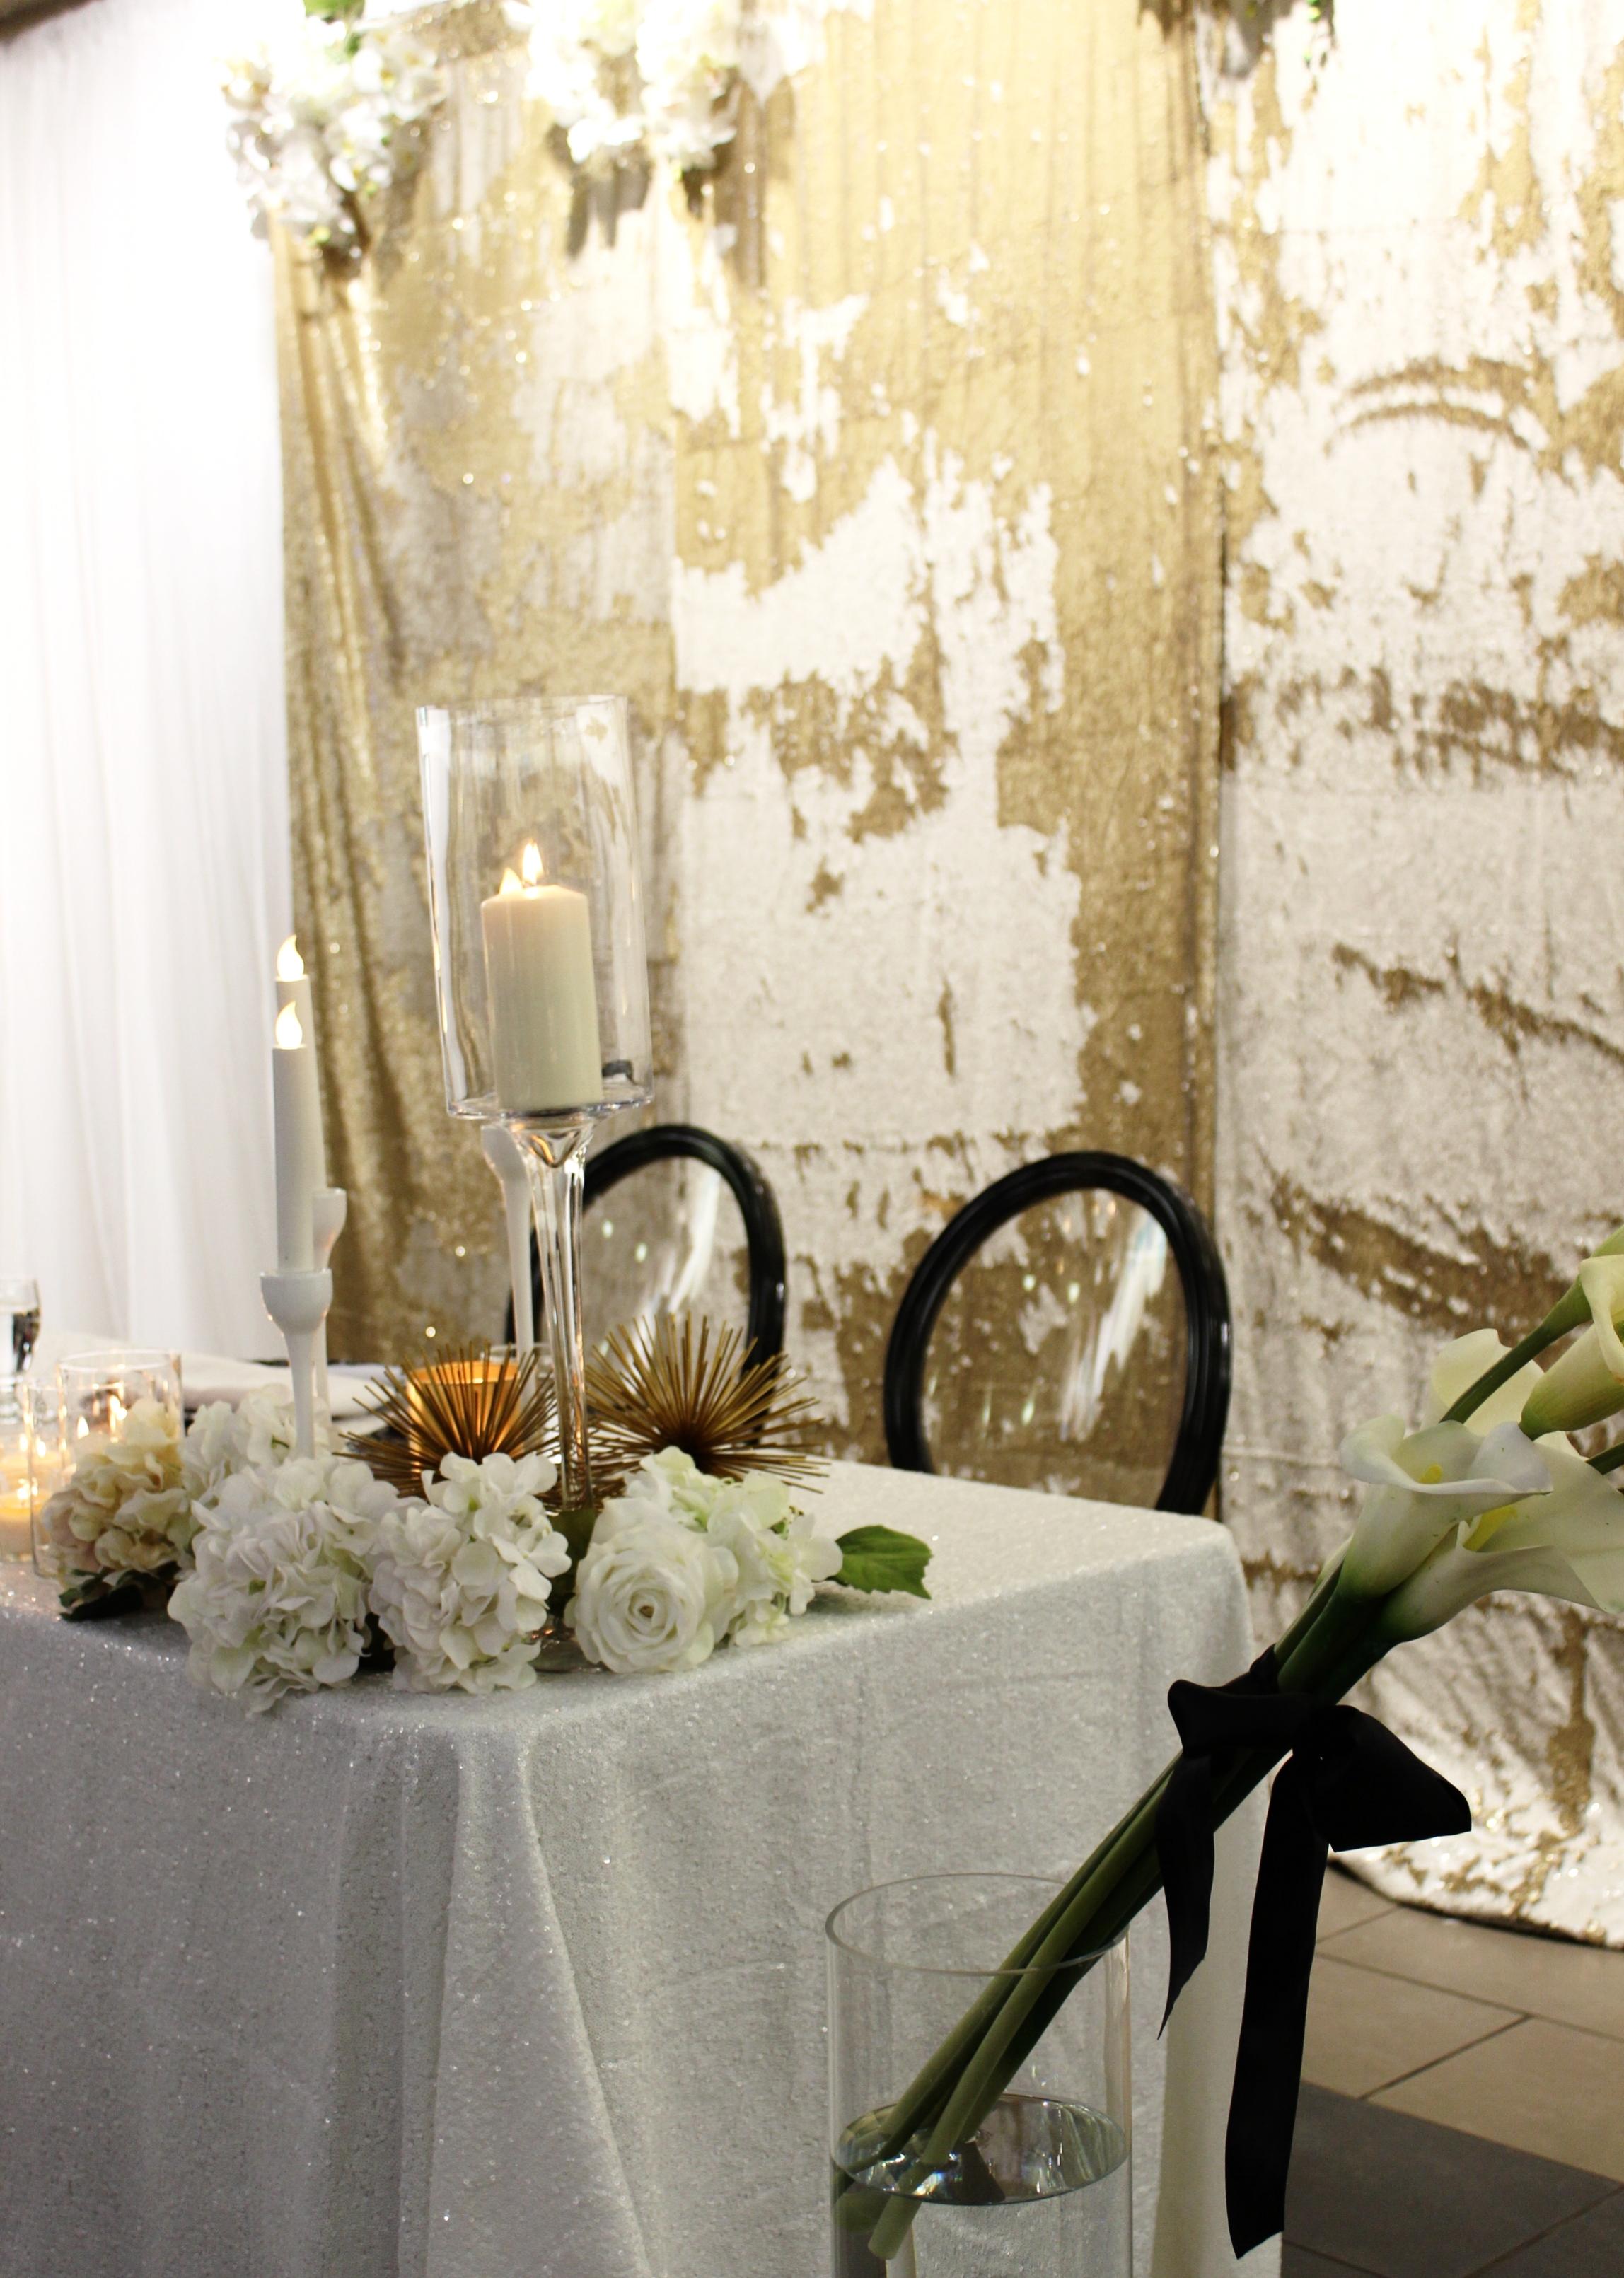 Photo courtesy of   www.michaelangelolucas.com